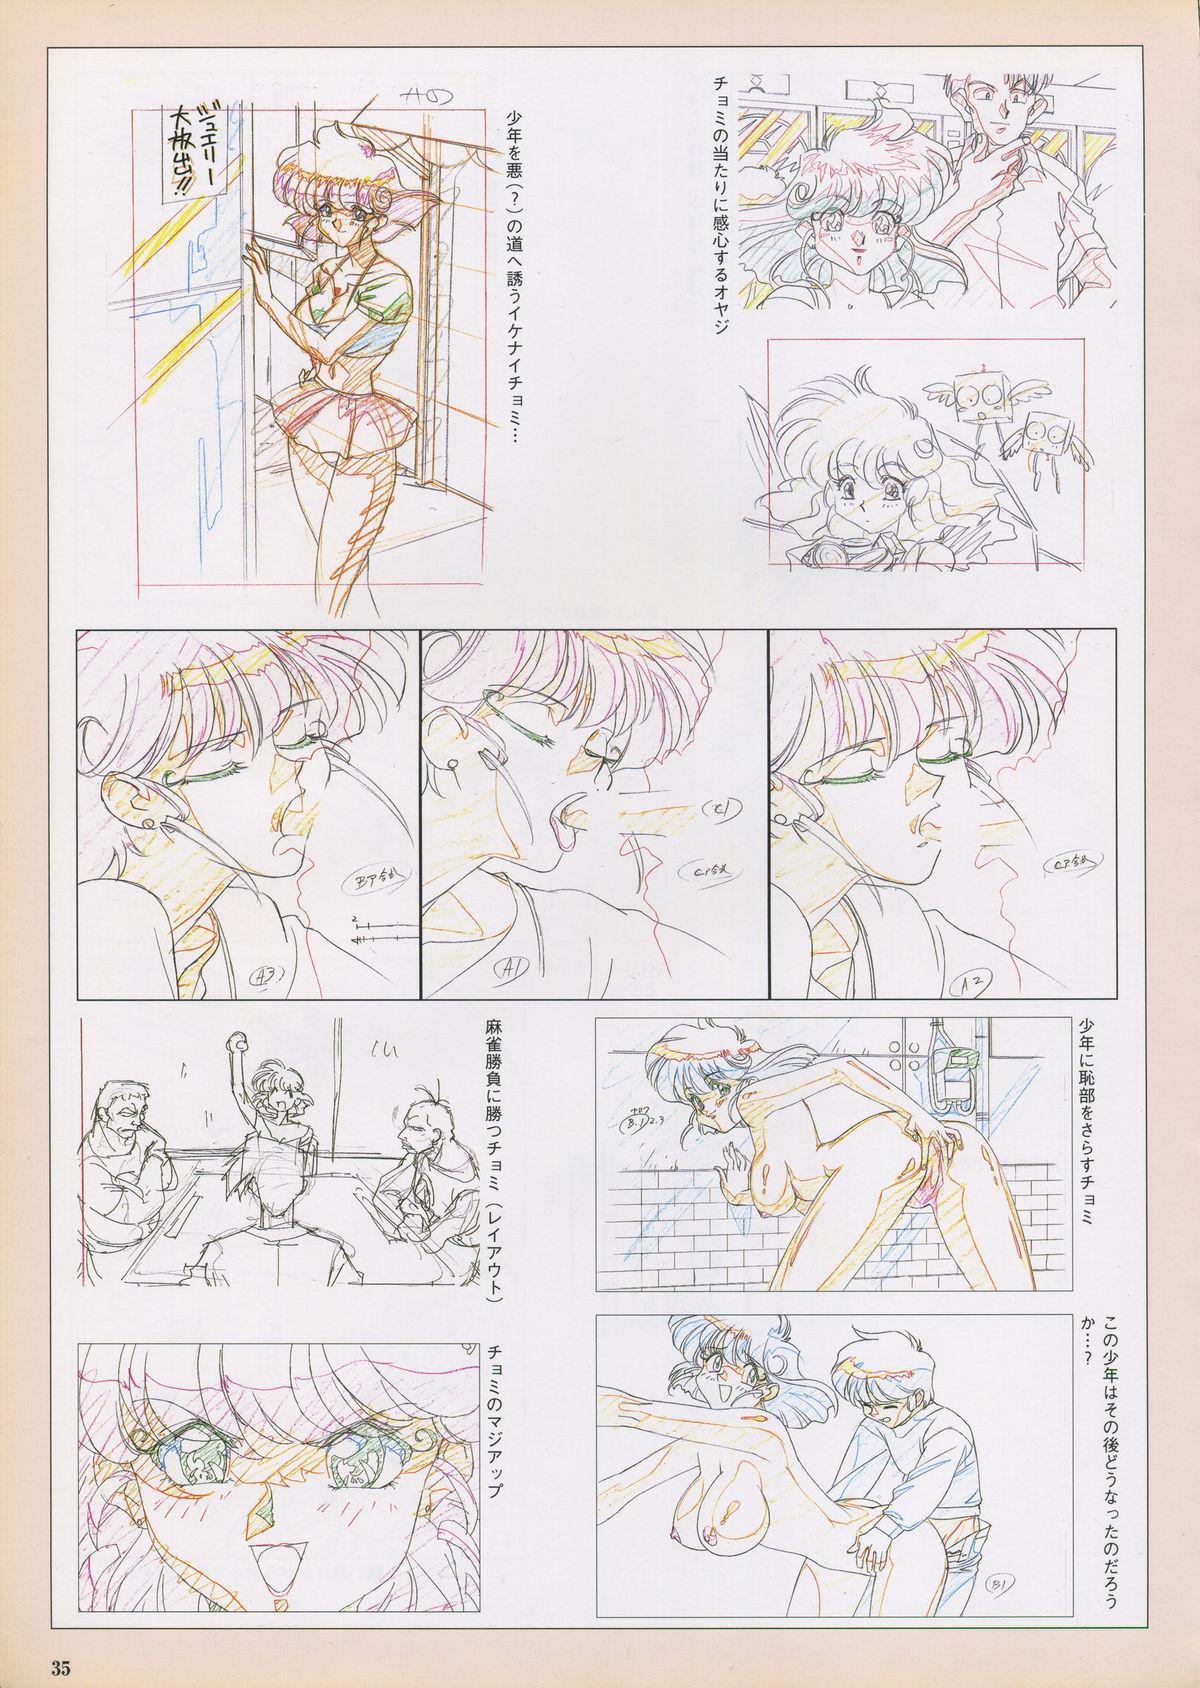 VIPER Series Official Artbook III 37